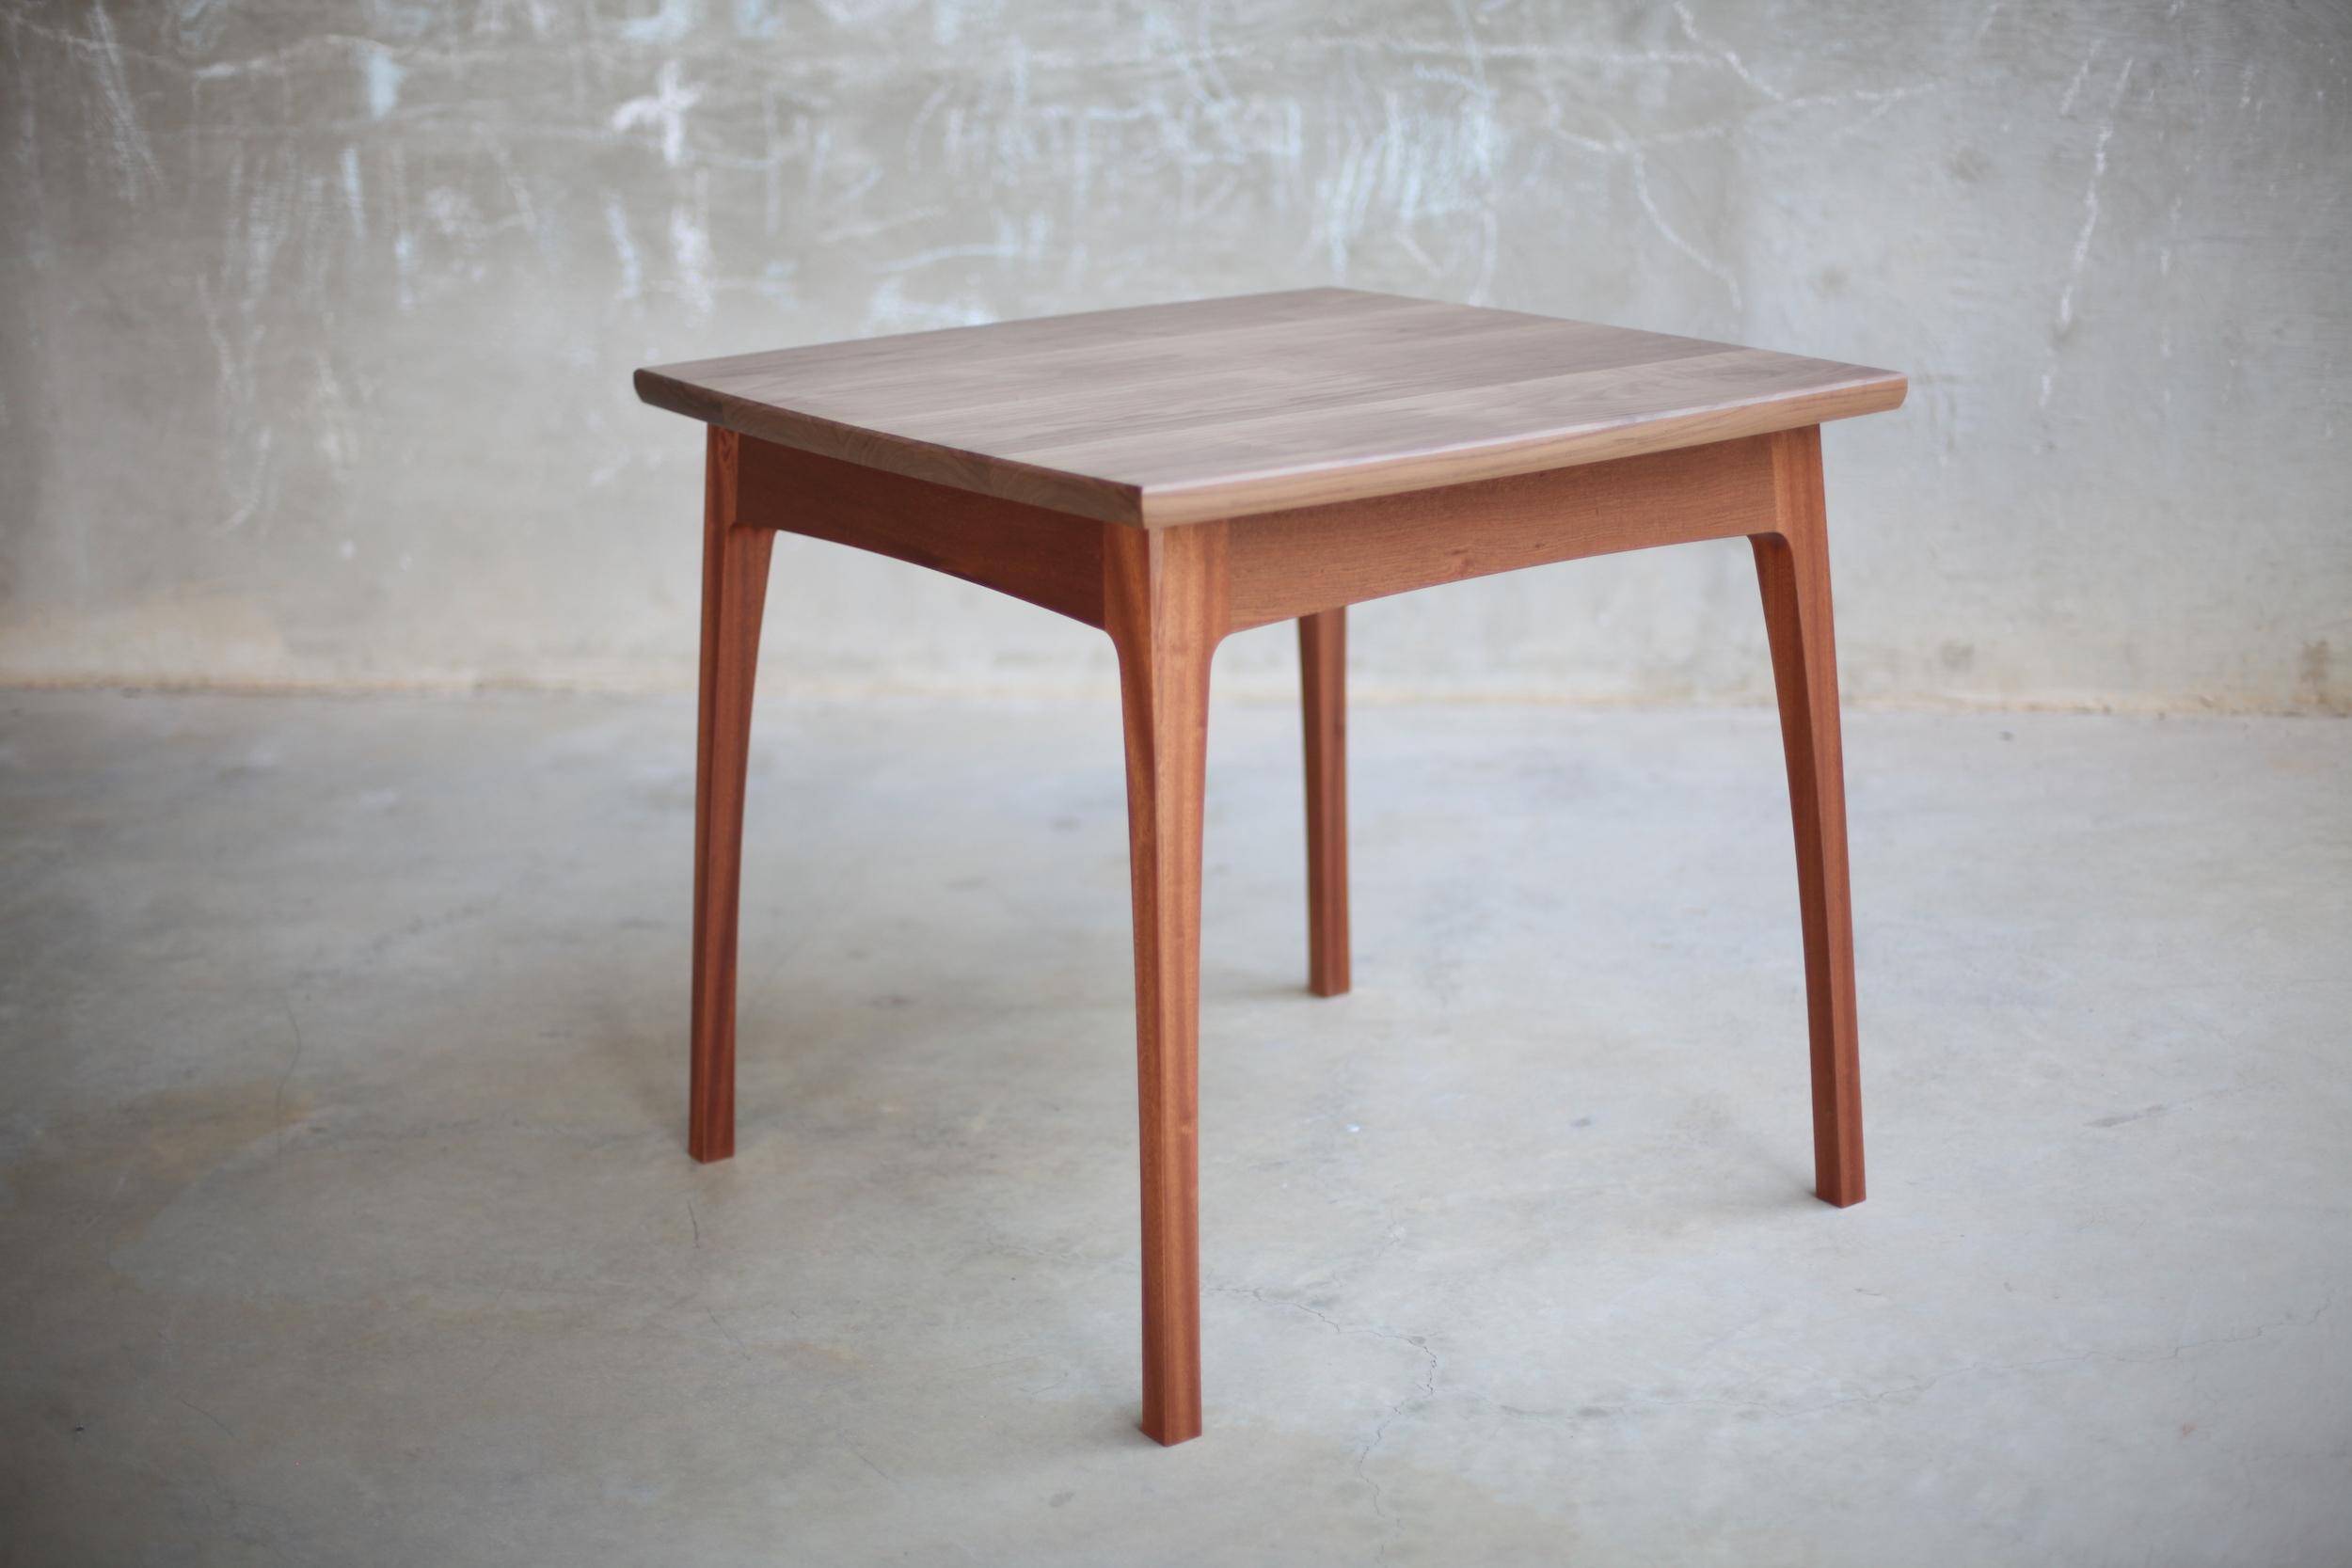 Morley Kitchen Table - The Wood Whisperer Guild